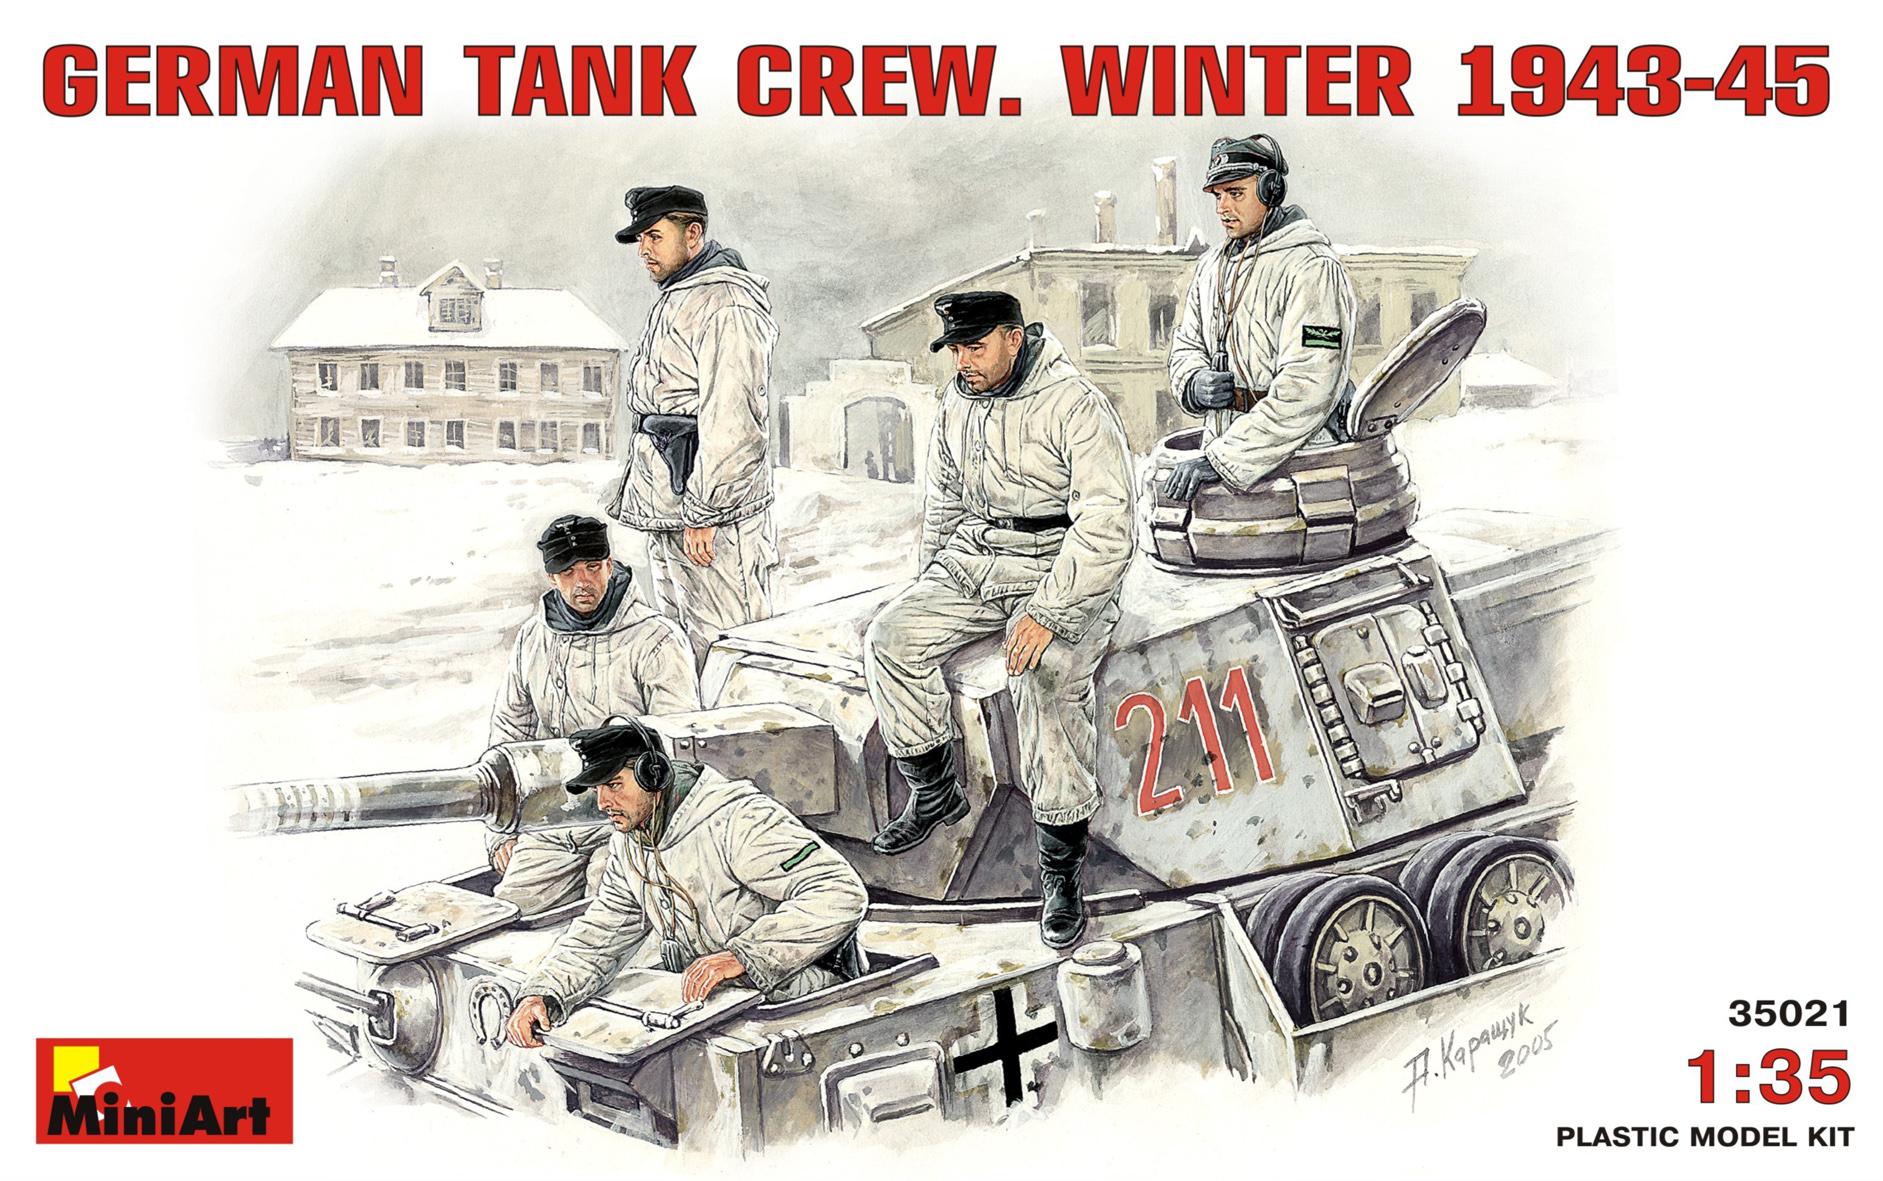 GERMAN TANK CREW. WINTER 1943-45